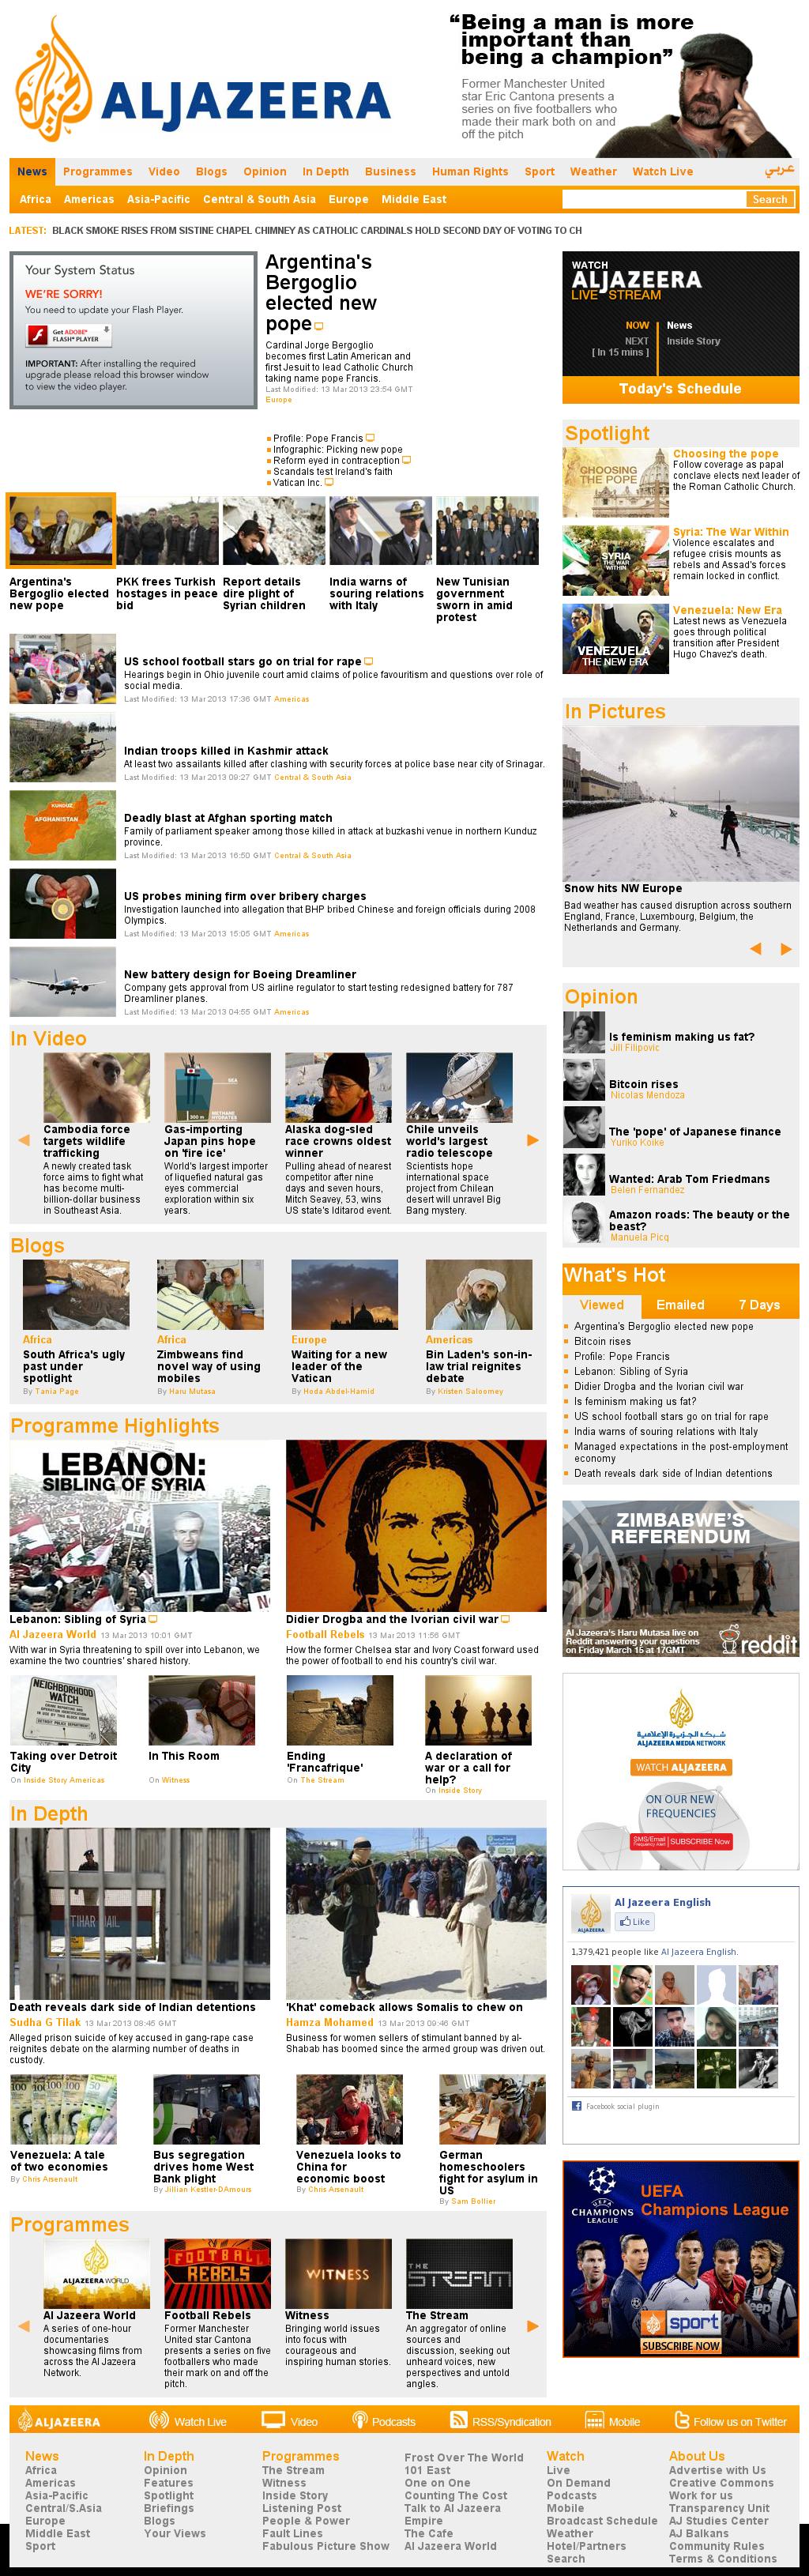 Al Jazeera (English) at Thursday March 14, 2013, 12:12 a.m. UTC